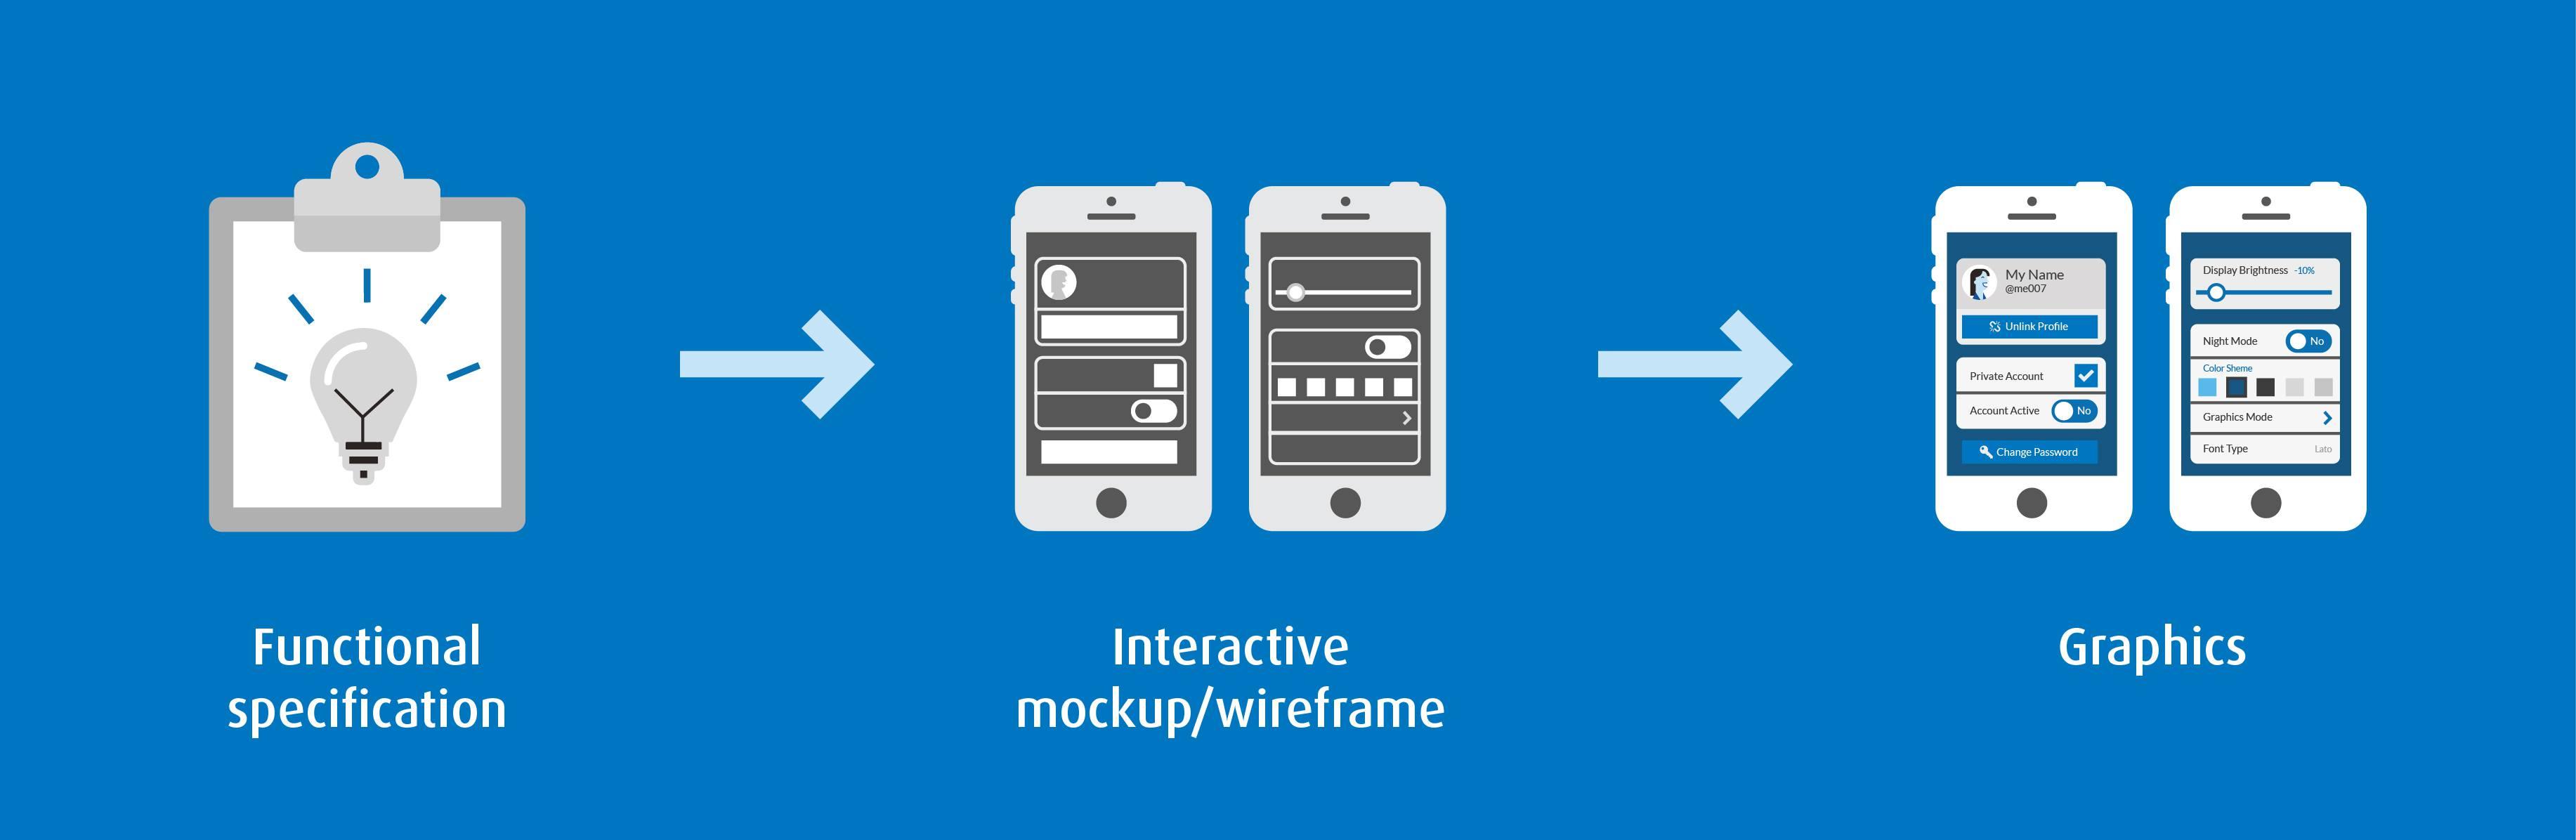 mobile-development-app-logic-functionality